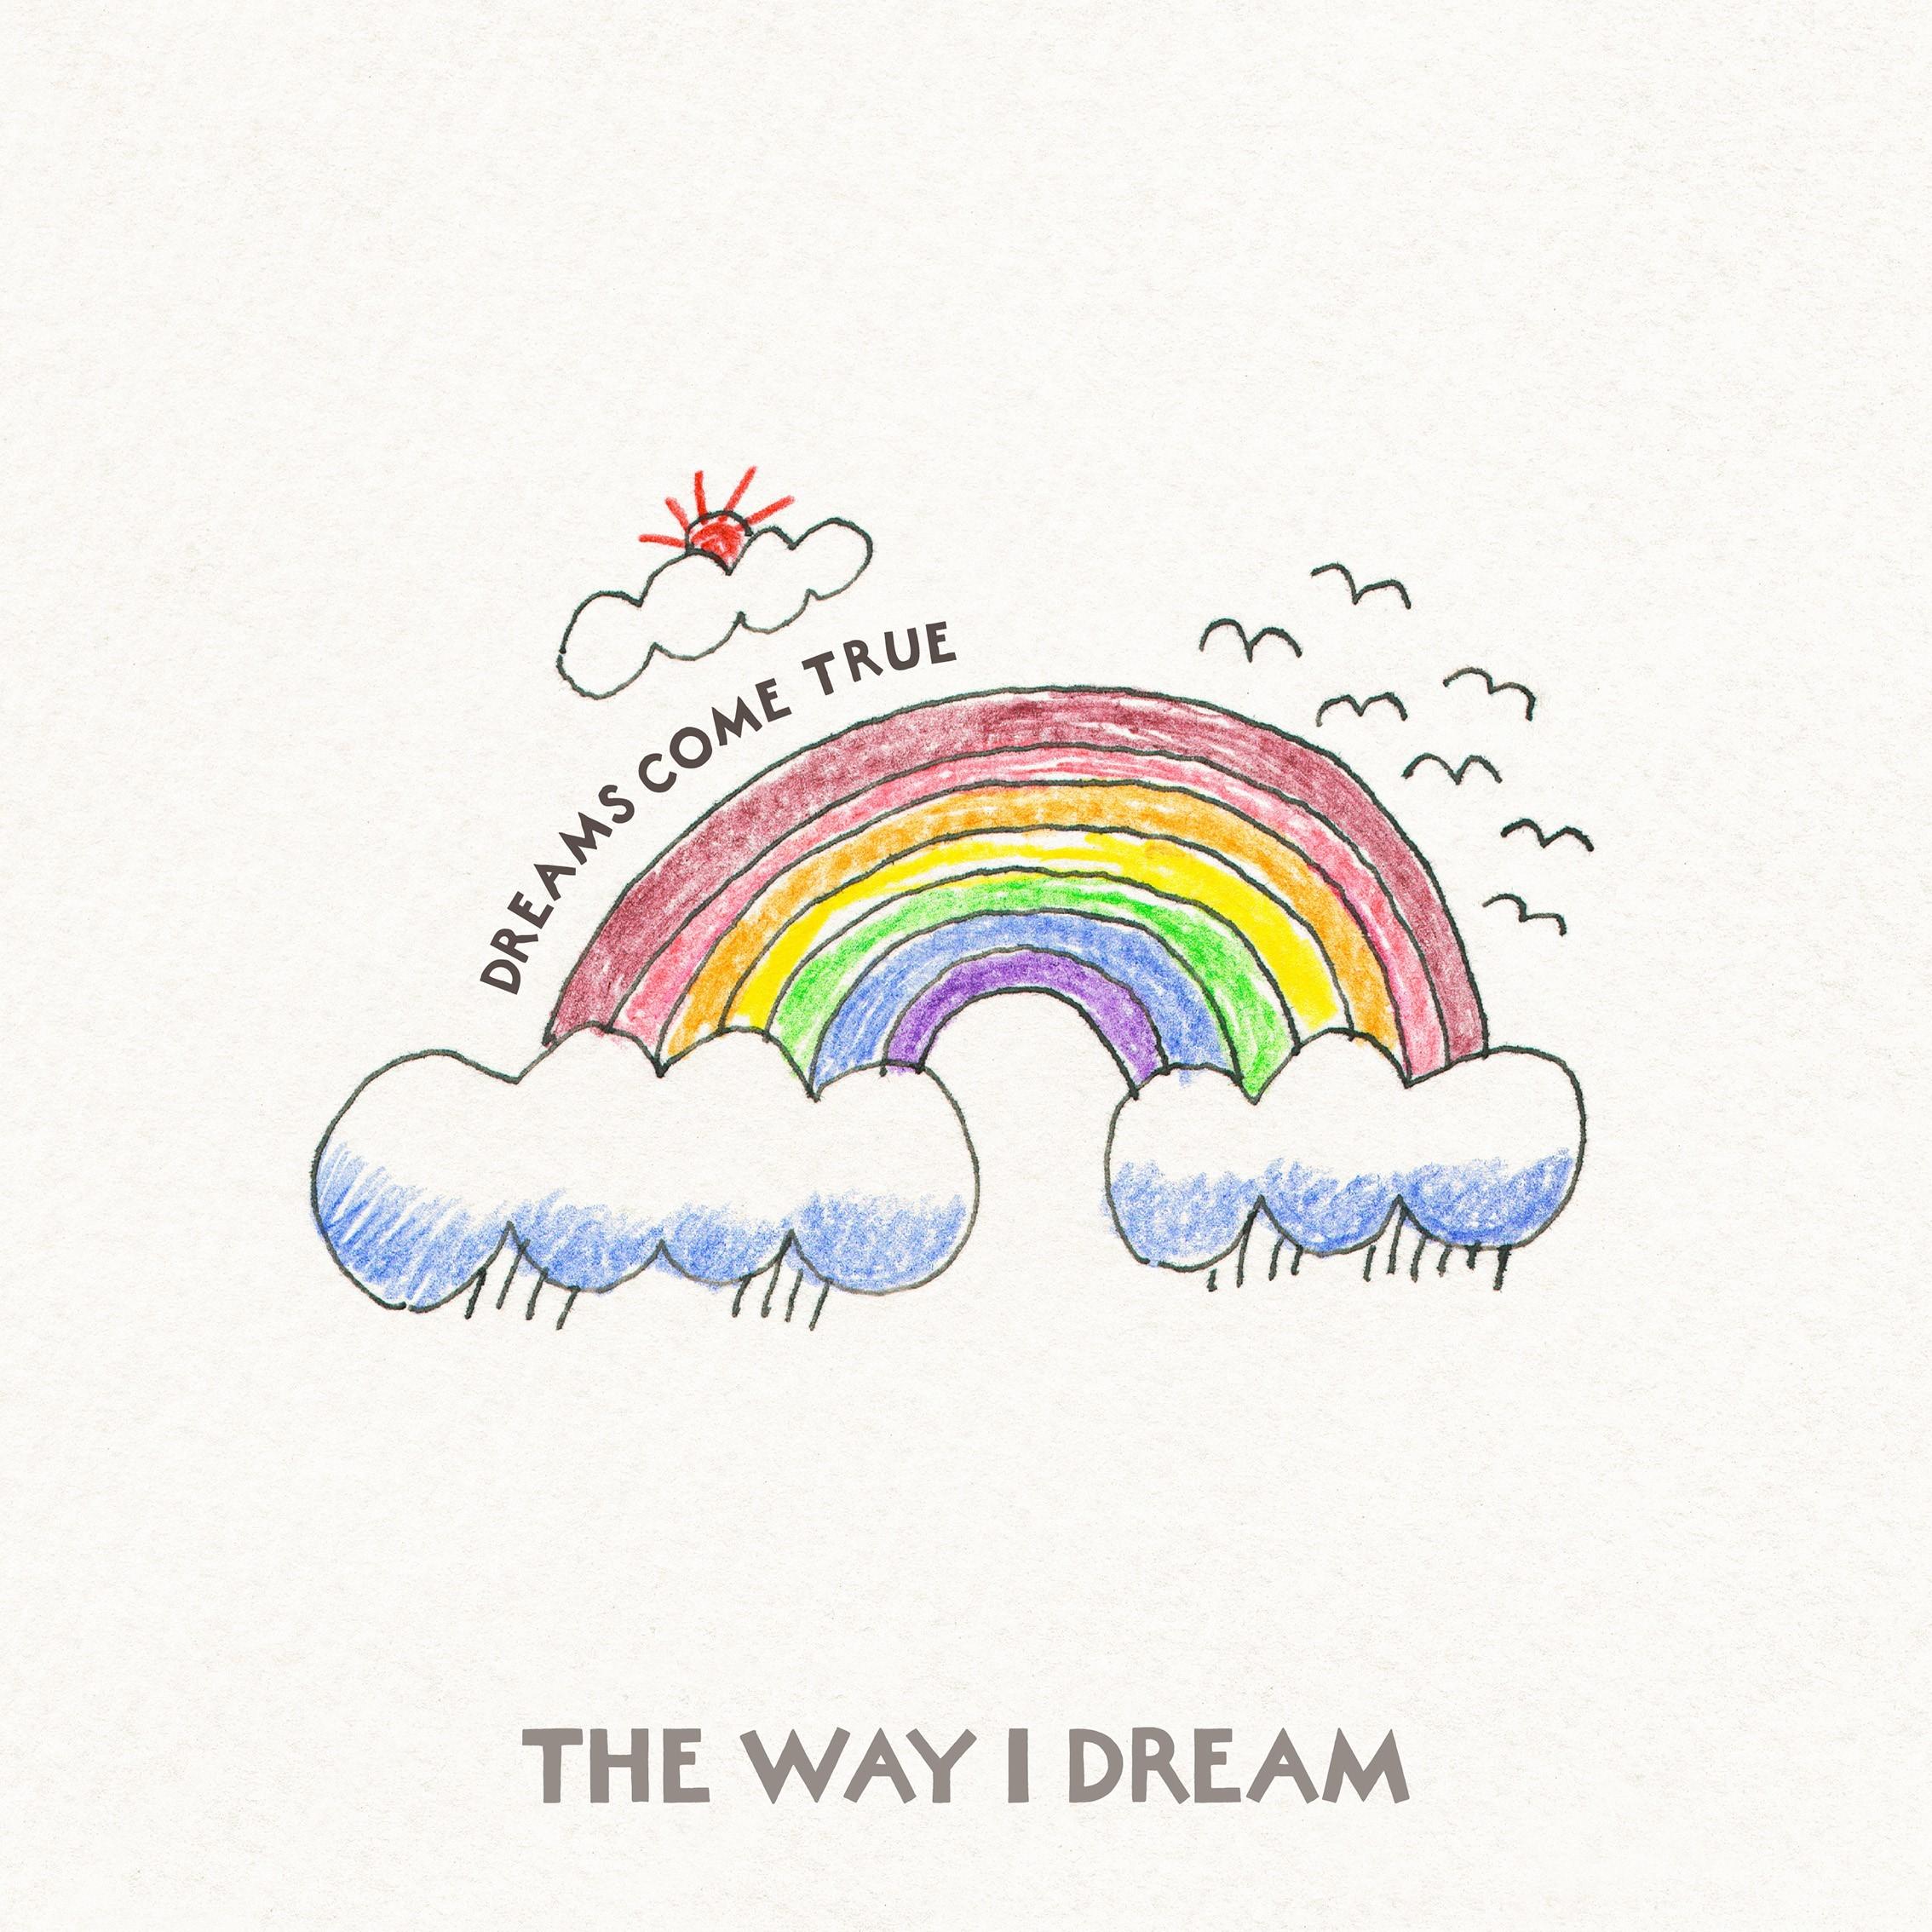 「THE WAY I DREAM」ジャケット